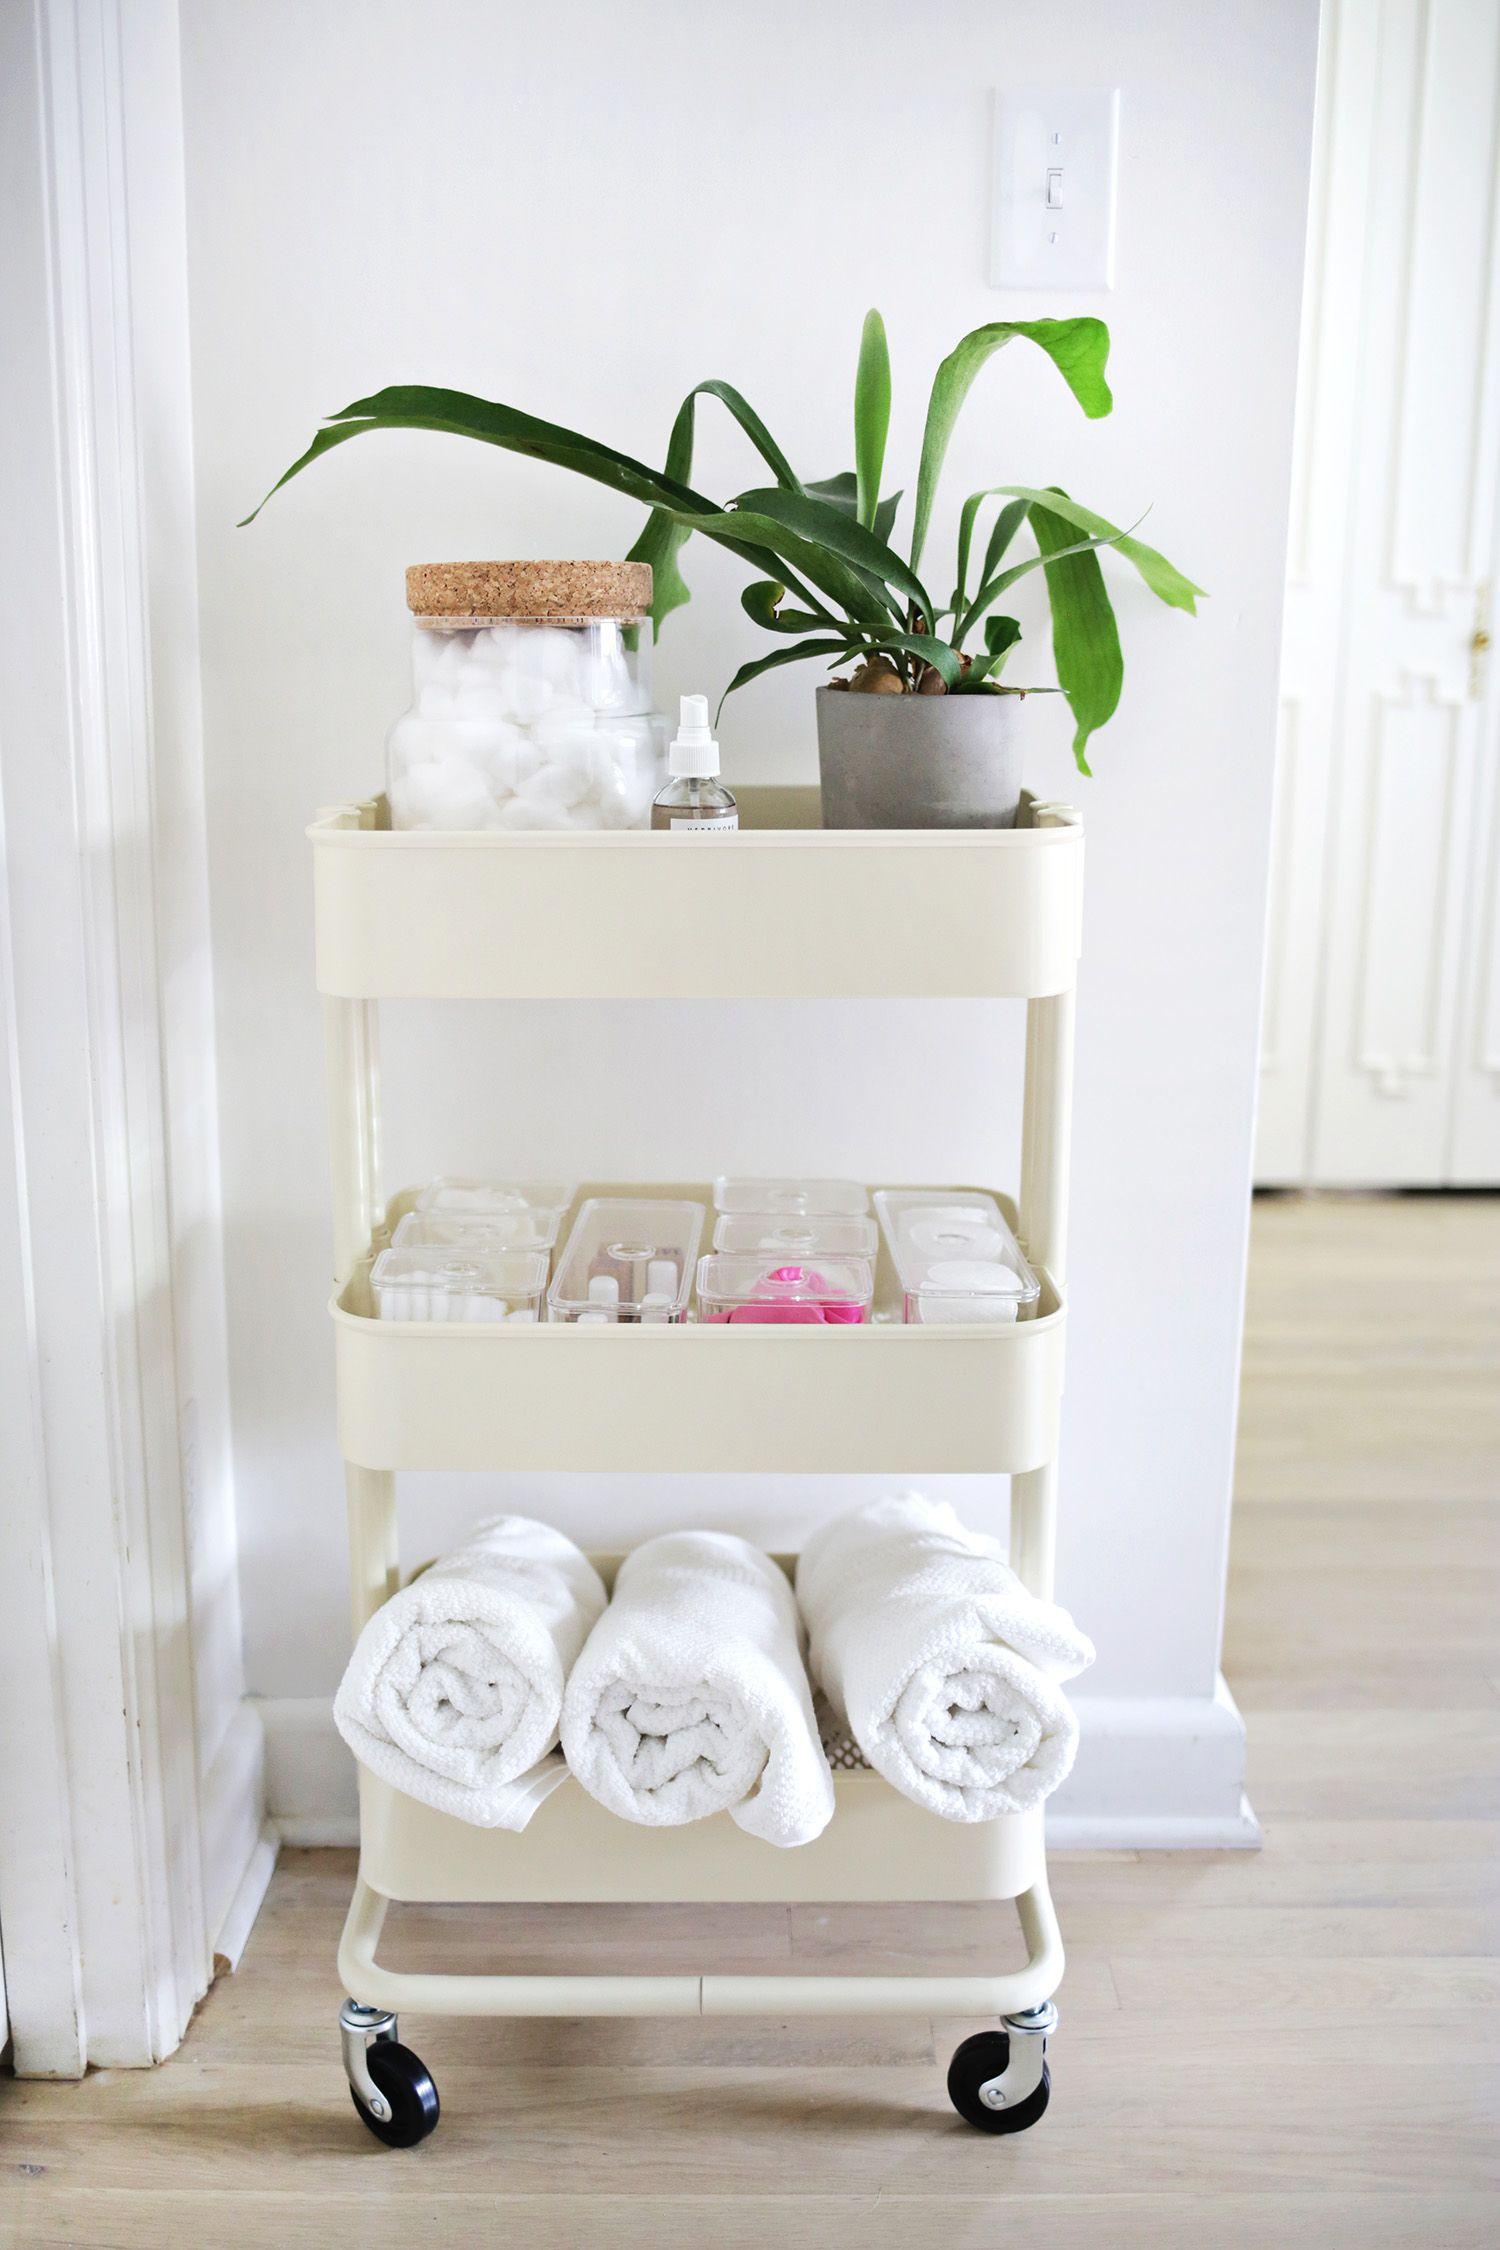 High Quality Smart Ways To Use Ikea Raskog Cart For Home Storage